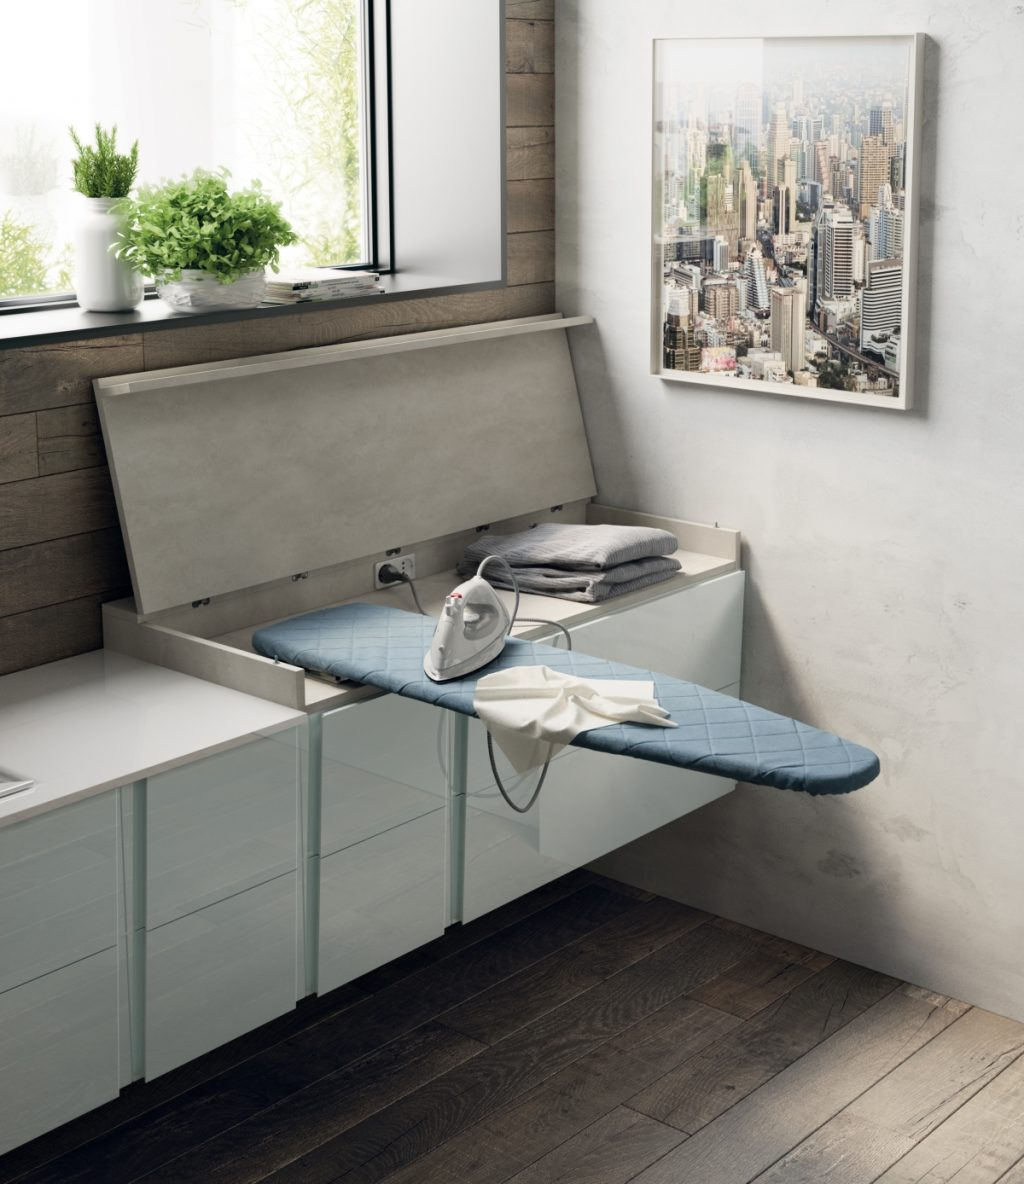 Scavoliniバスルームによるランドリースペース